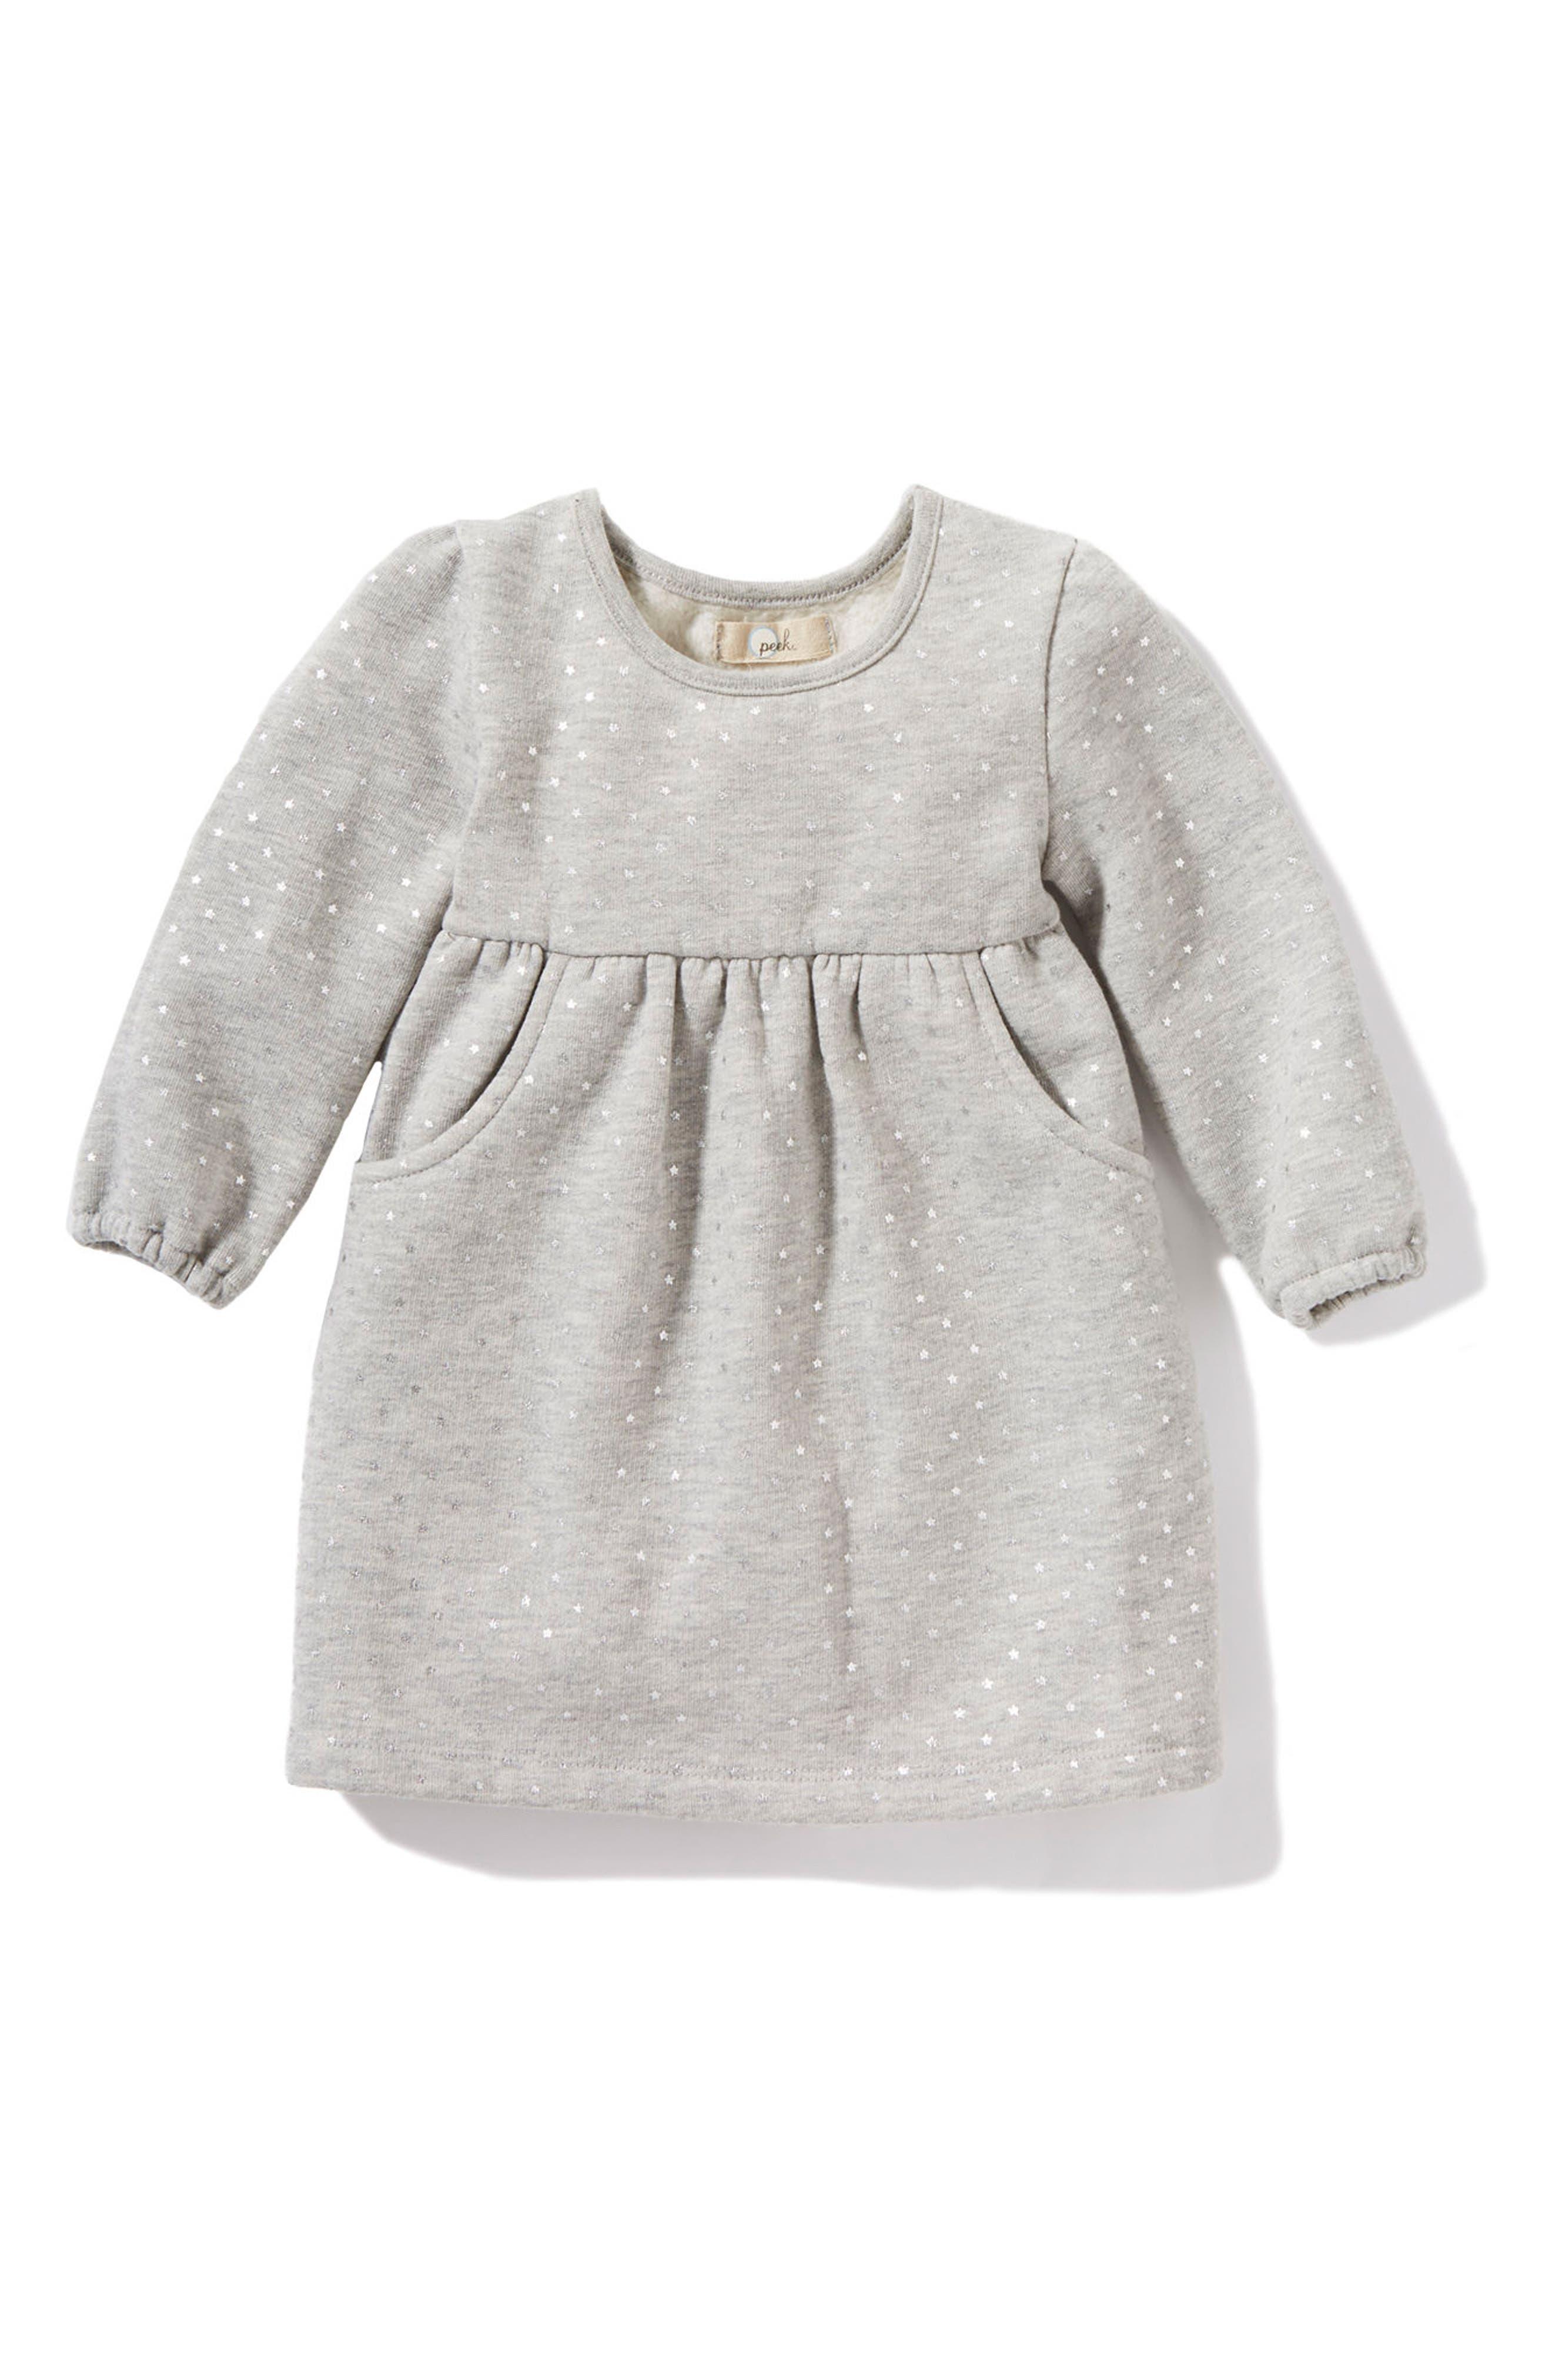 Main Image - Peek Star Dress (Baby Girls)